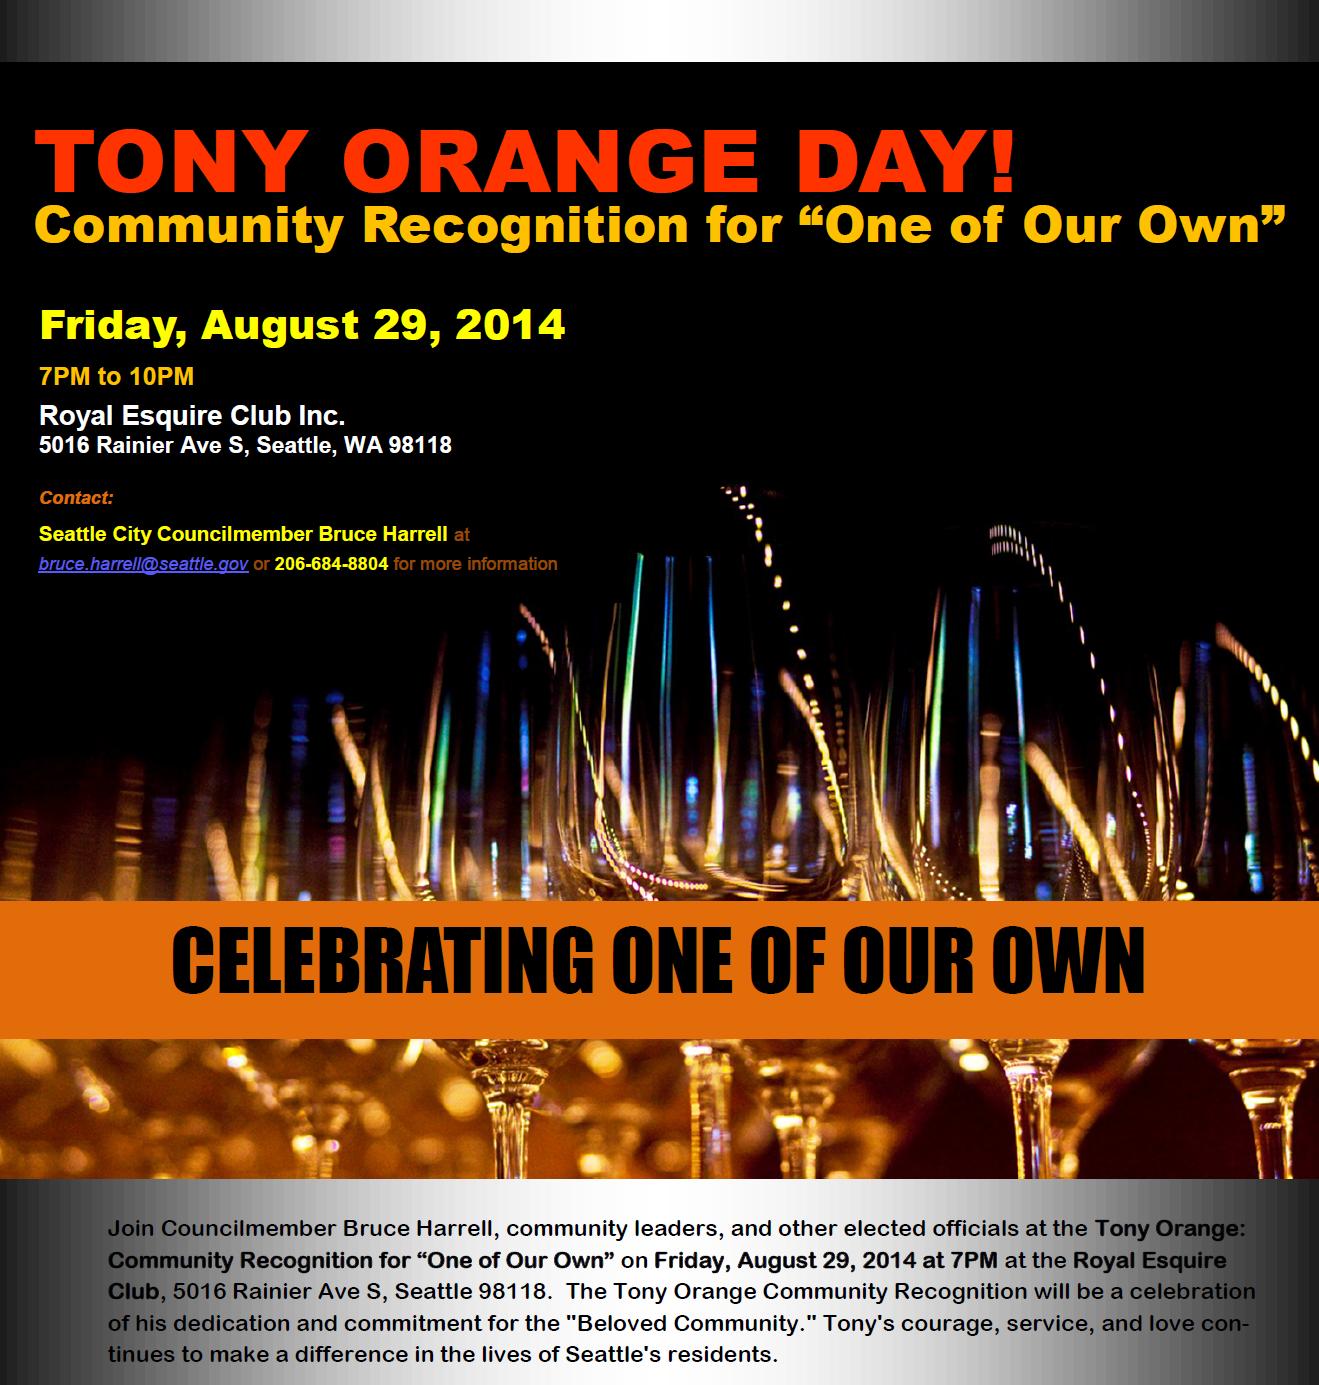 Tony Orange Day!